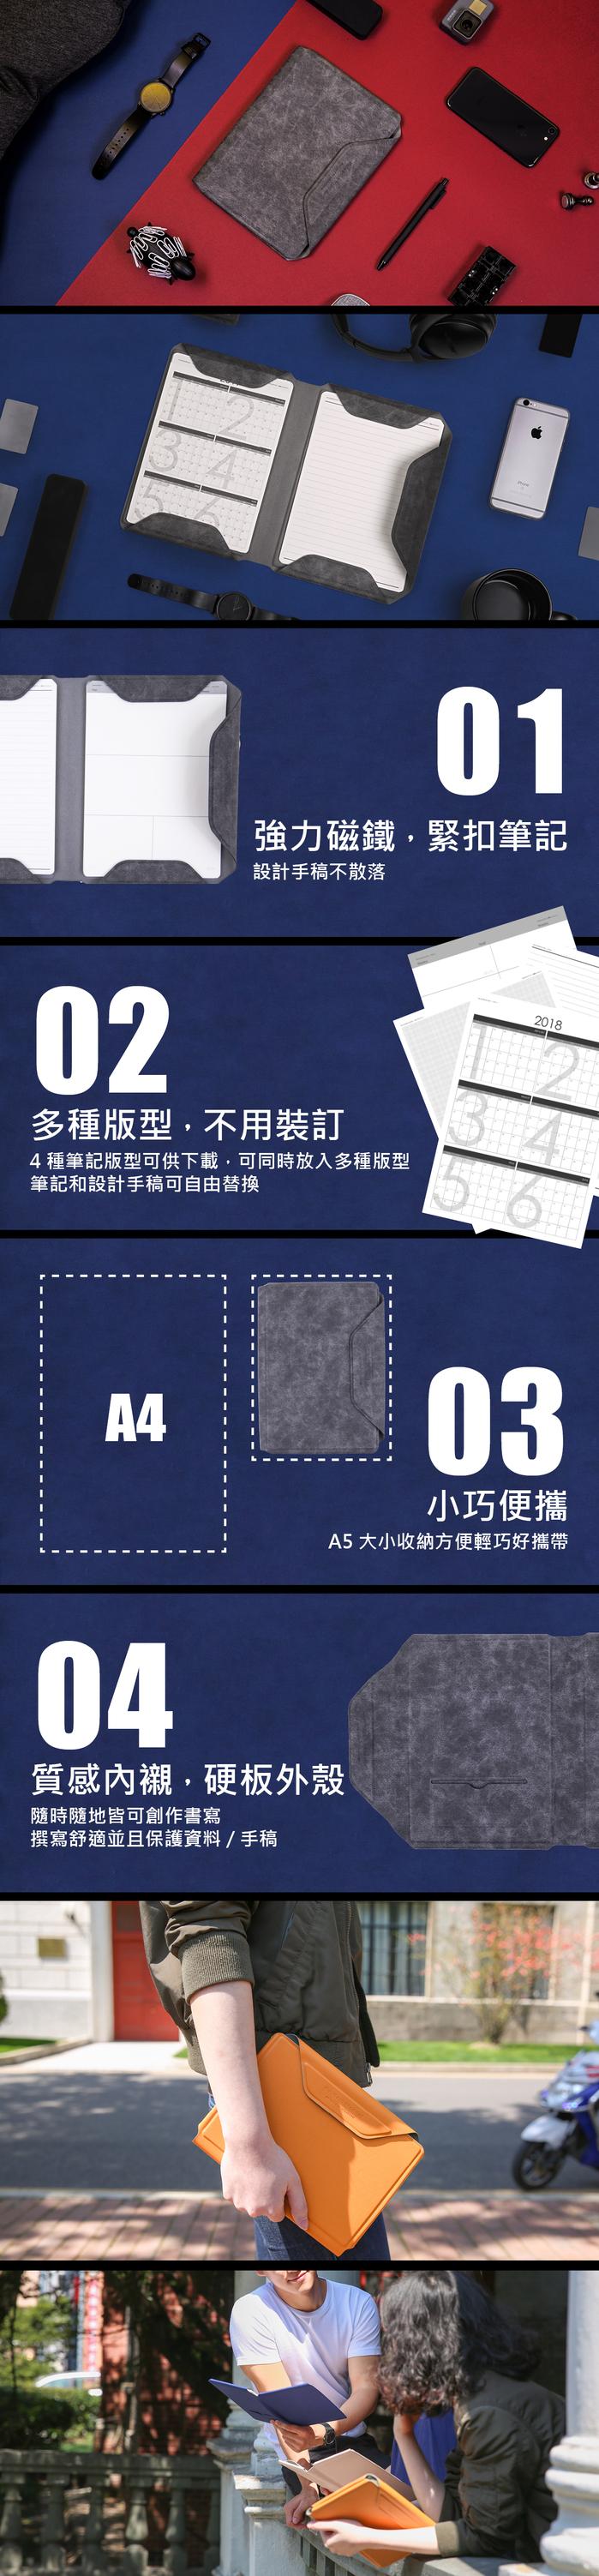 (複製)Allocacoc | NoteBook Modular 迷你百搭筆記本 - 棕色